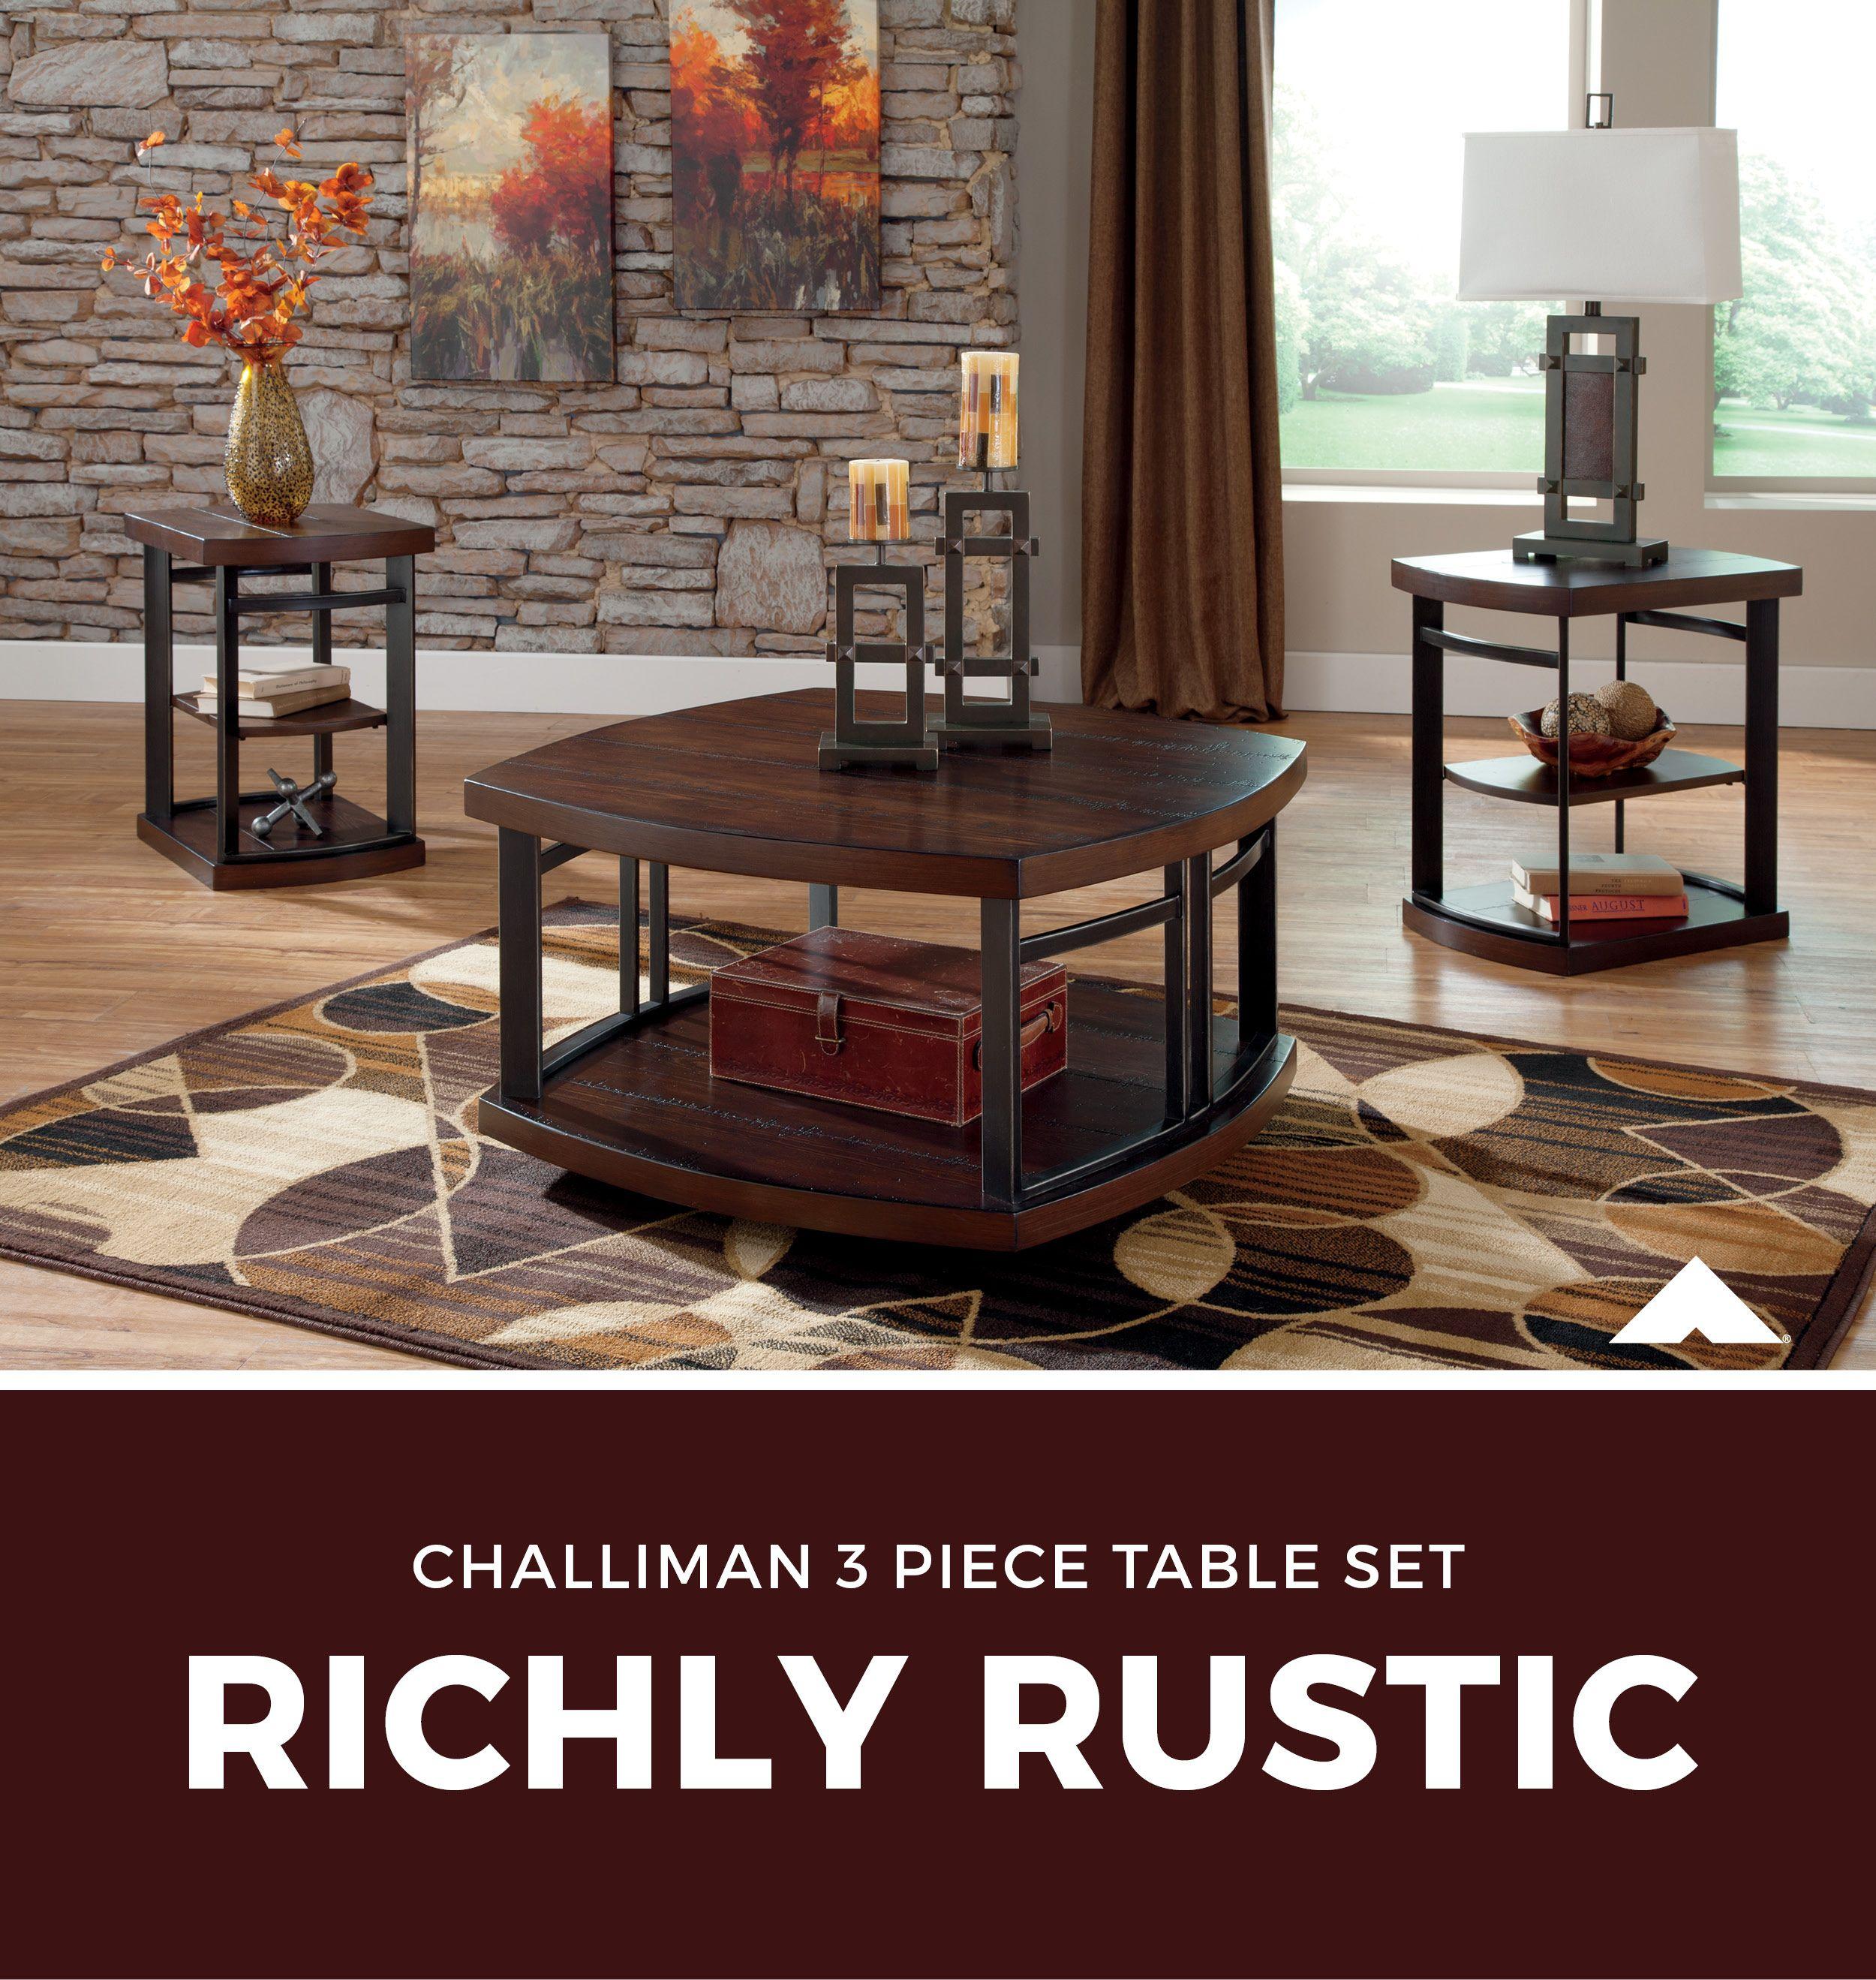 Challiman Rustic Brown Occasional Table Set By Ashley Furniture Ashleyfurniture Homedecor Livingroom Tables